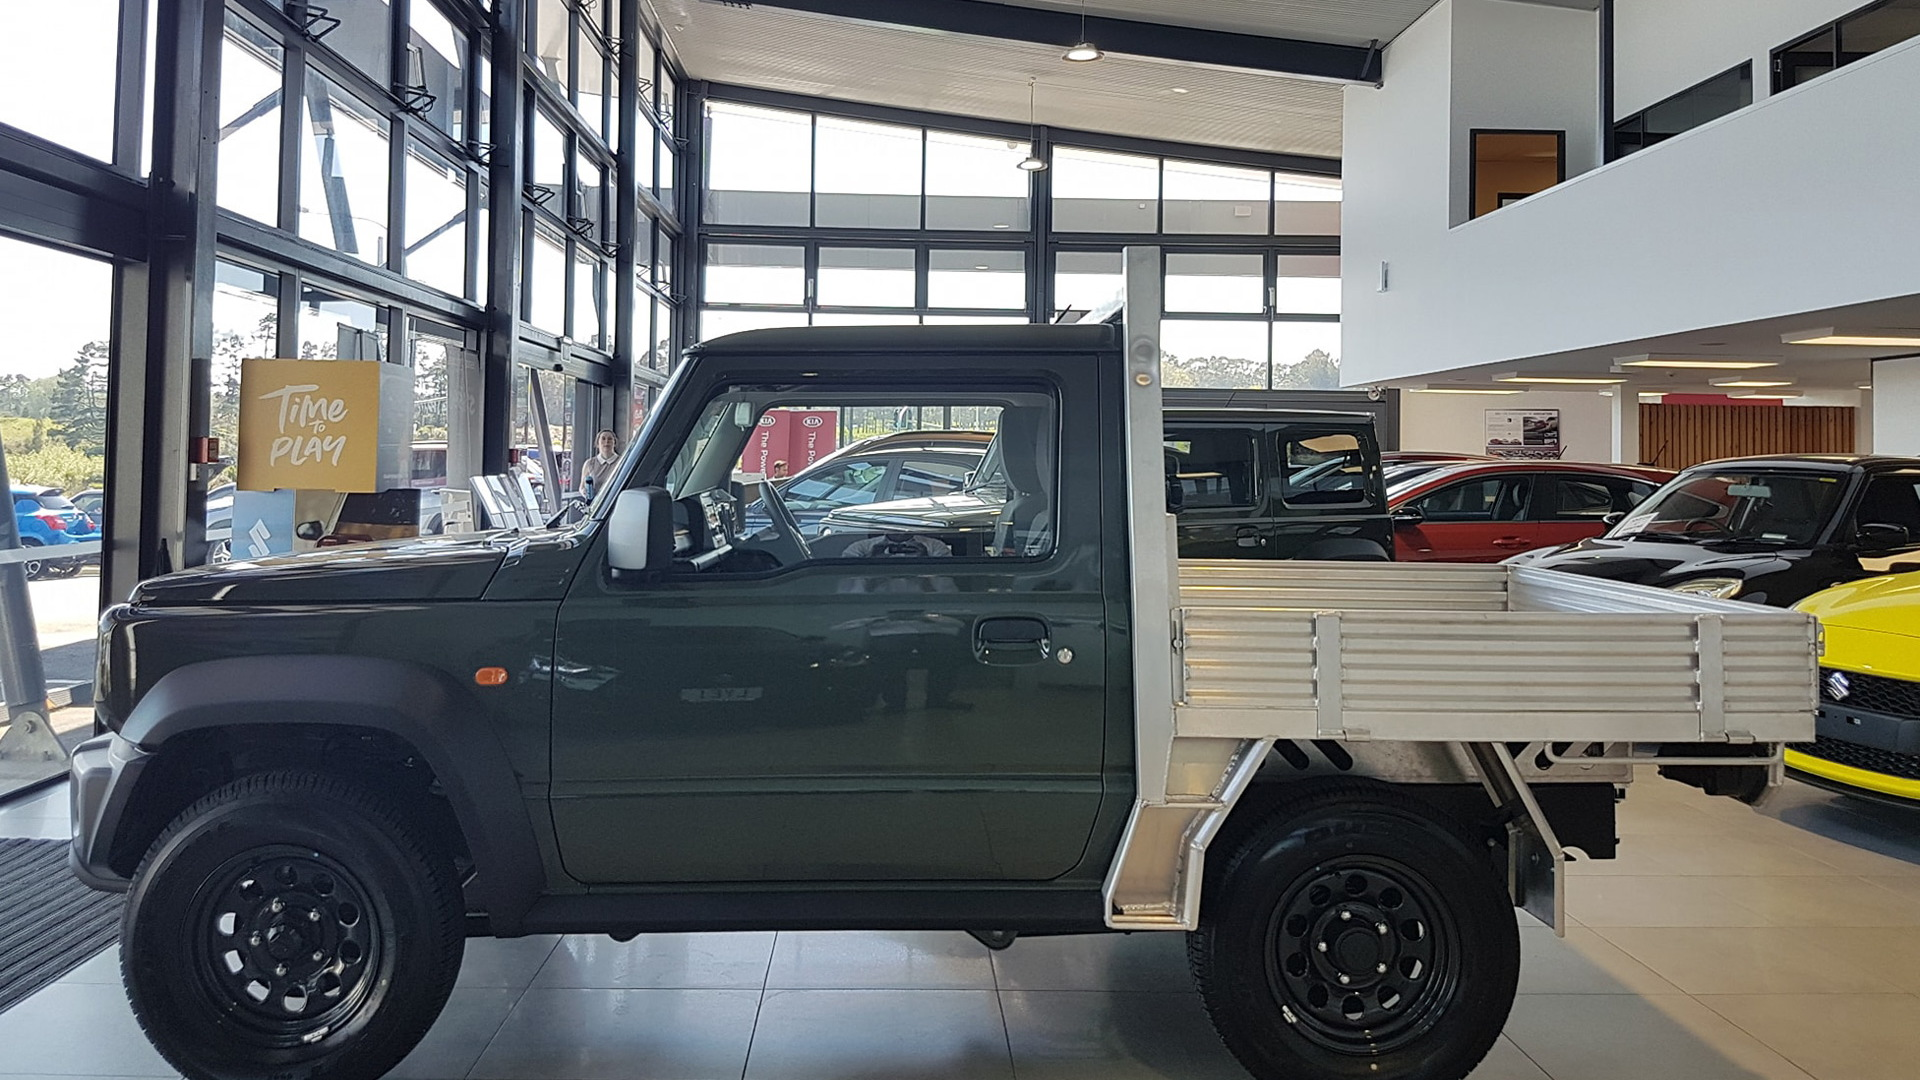 2019 Suzuki Jimny Flatdeck pickup truck conversion - Photo credit: West City Suzuki/Facebook